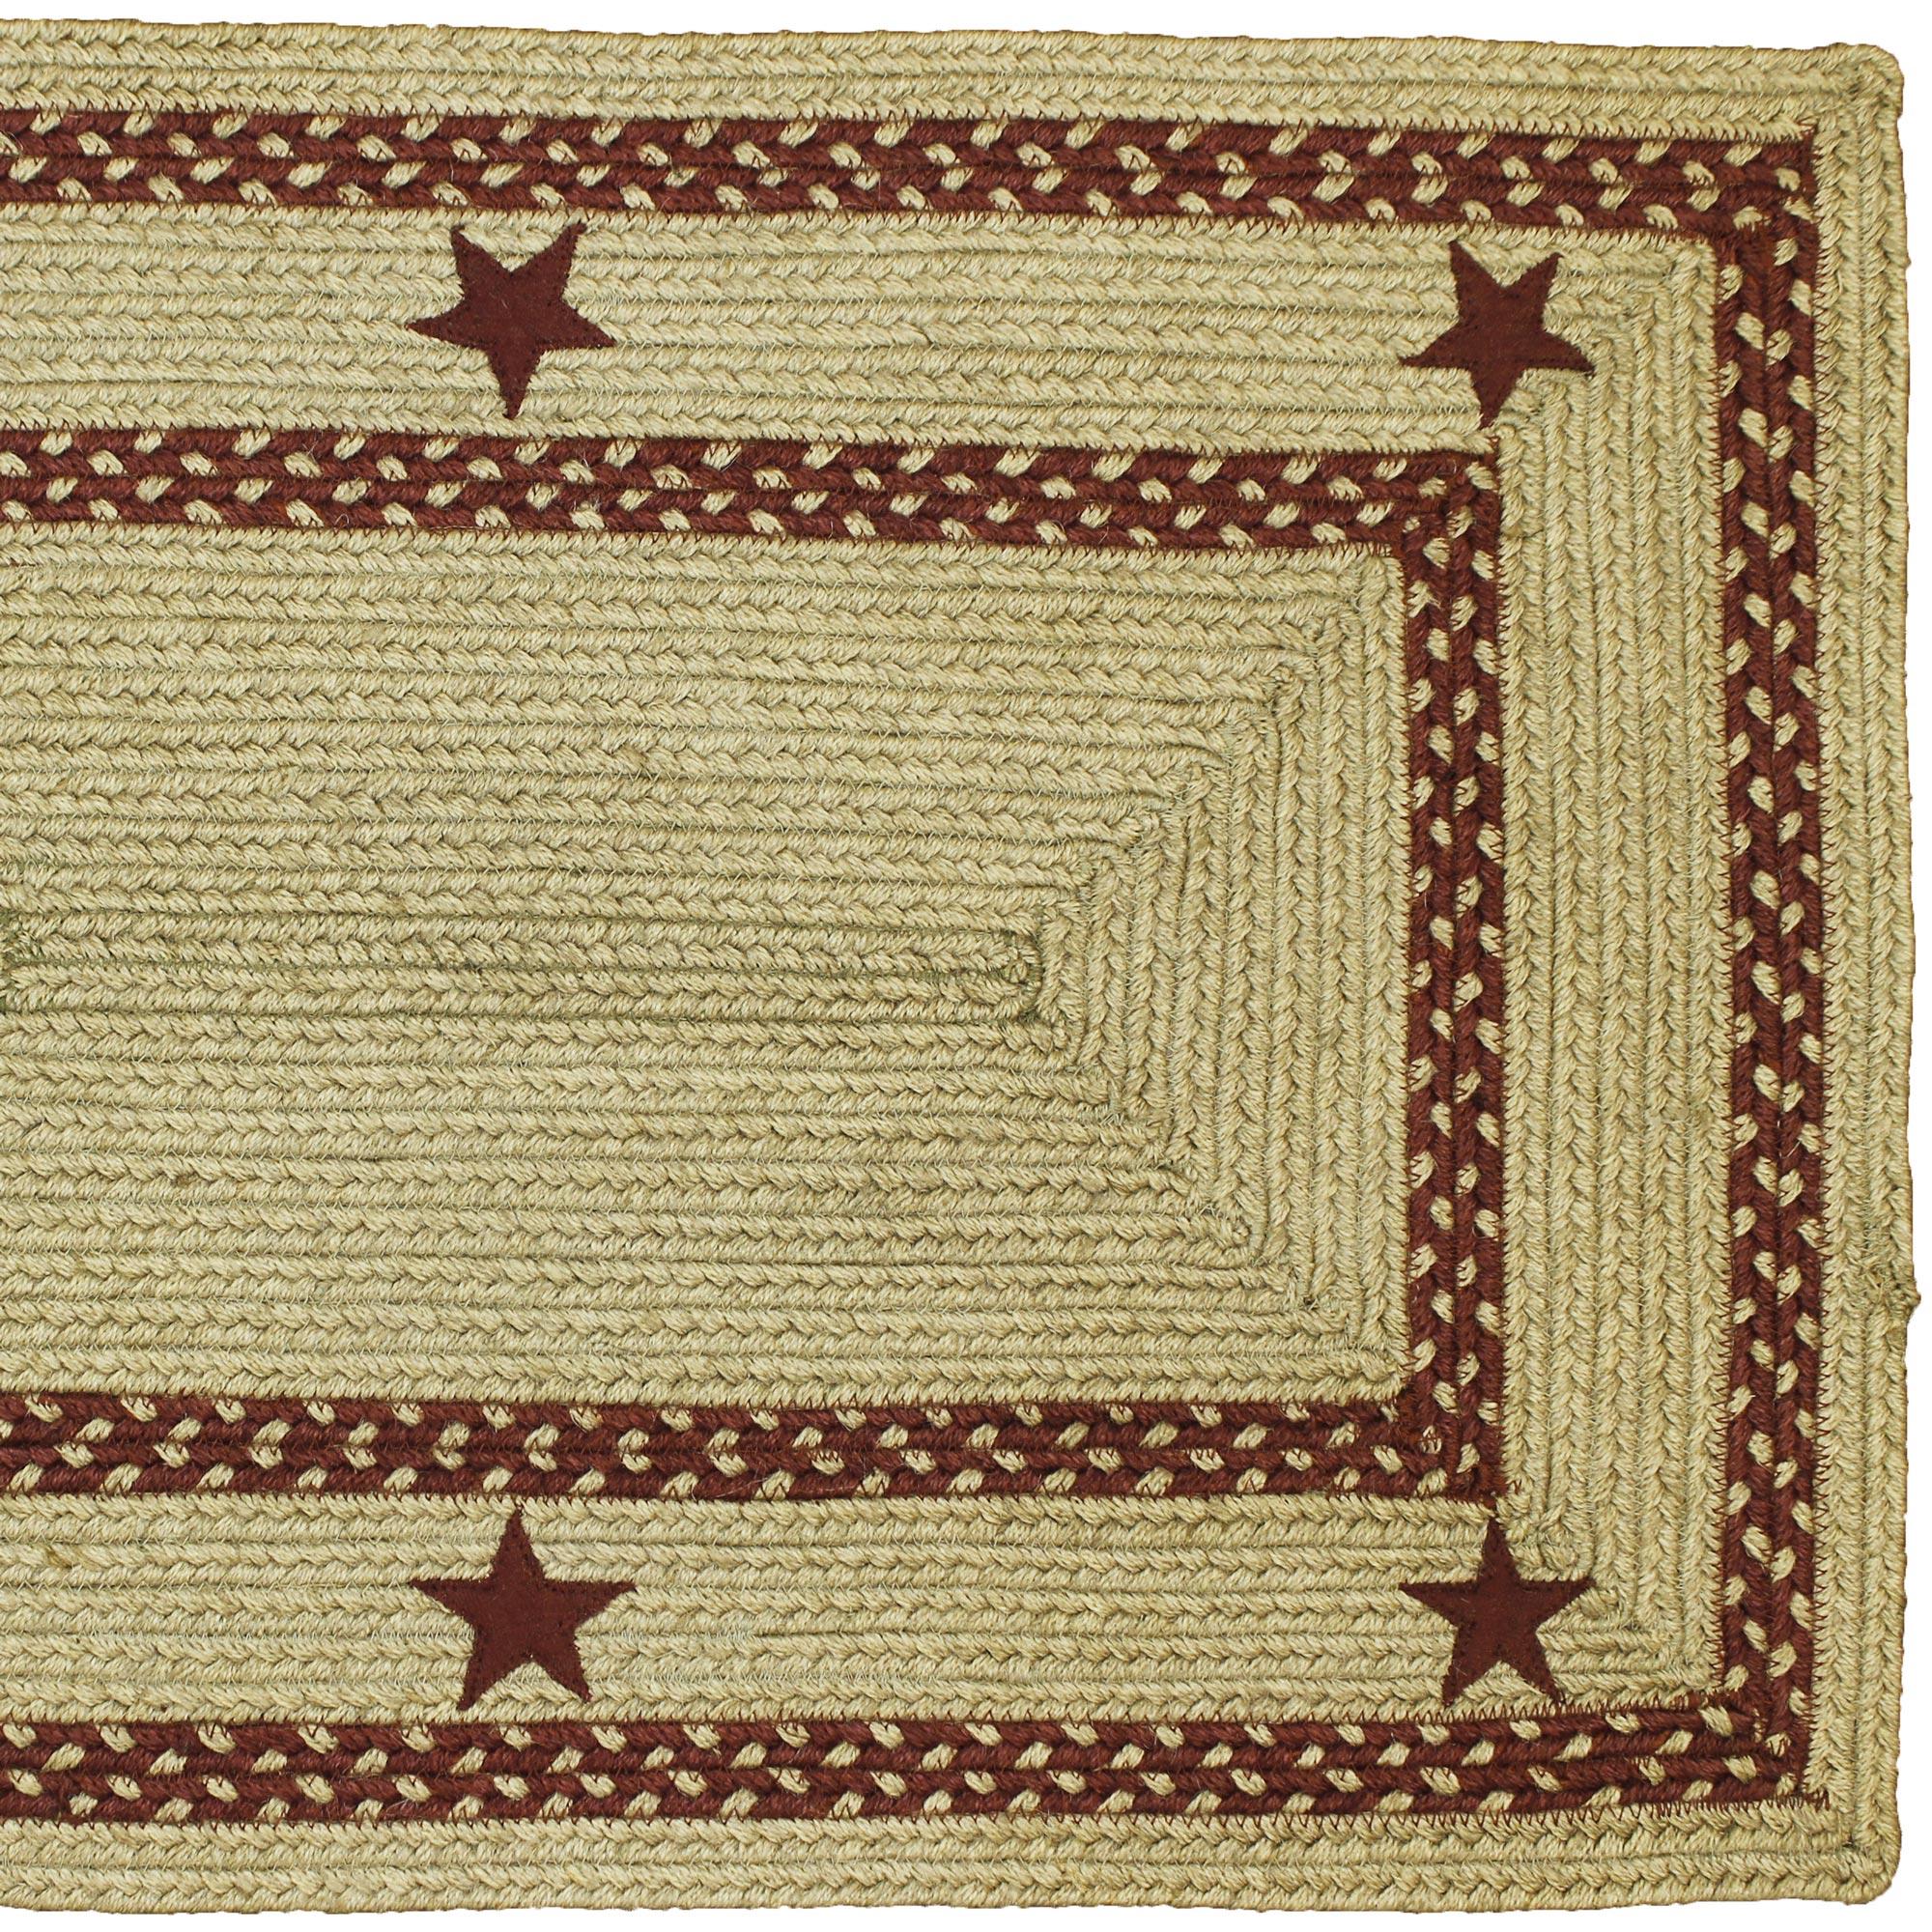 Texas Star Braided Jute Area Rugs Ebay